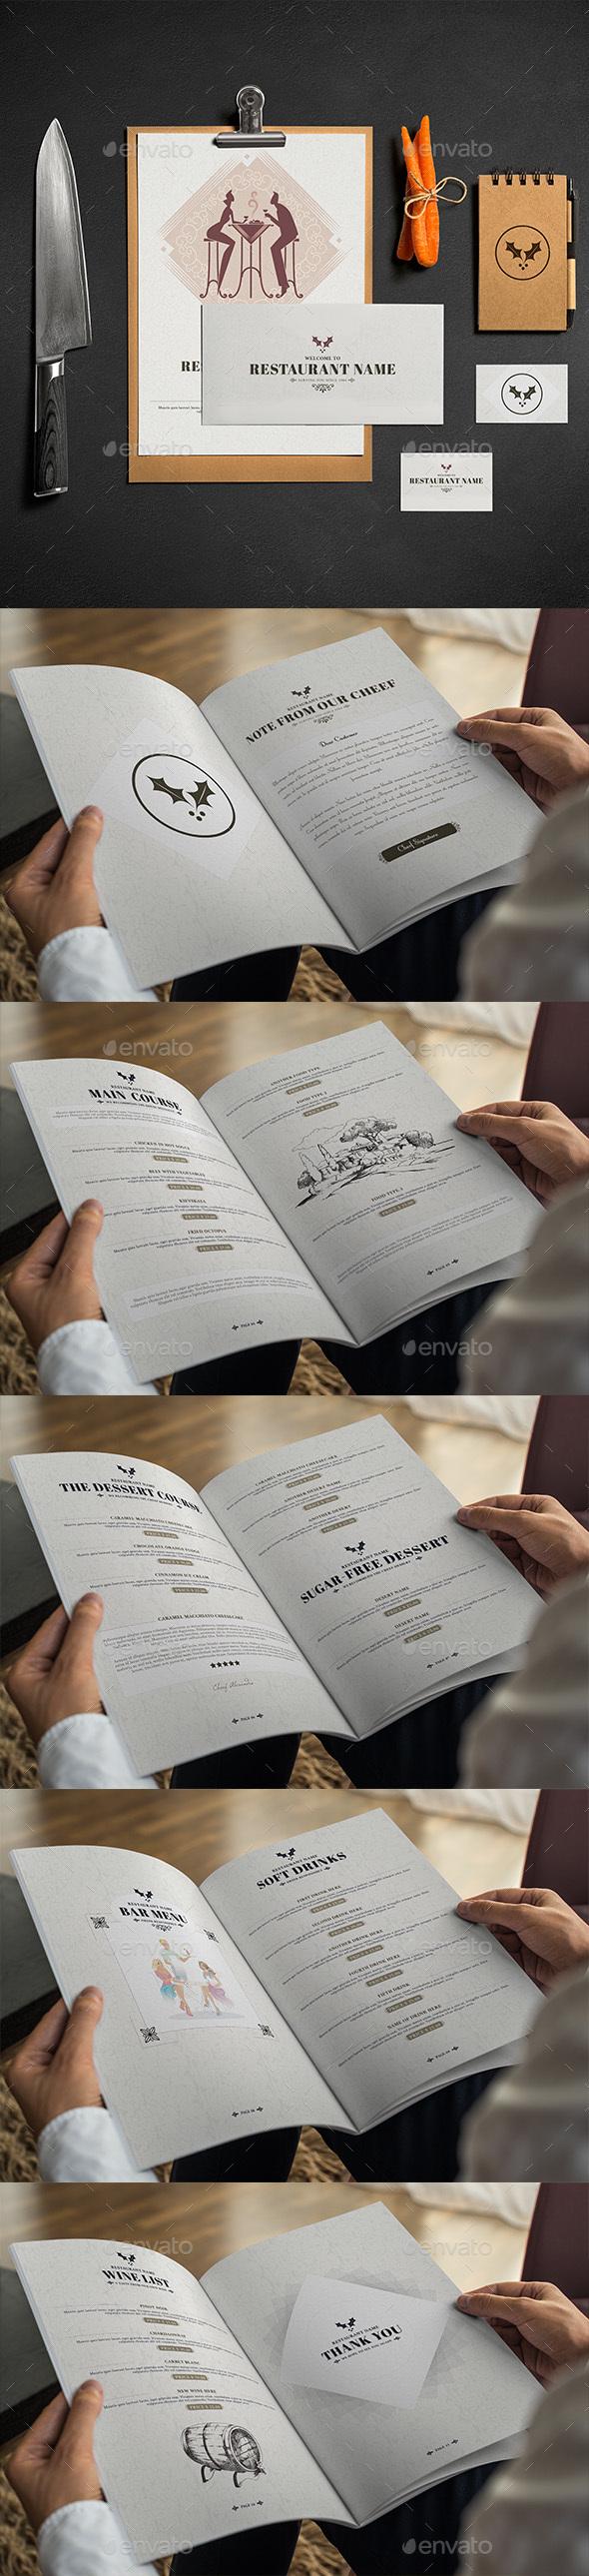 Classic And Elegant Restaurant Menu - Food Menus Print Templates